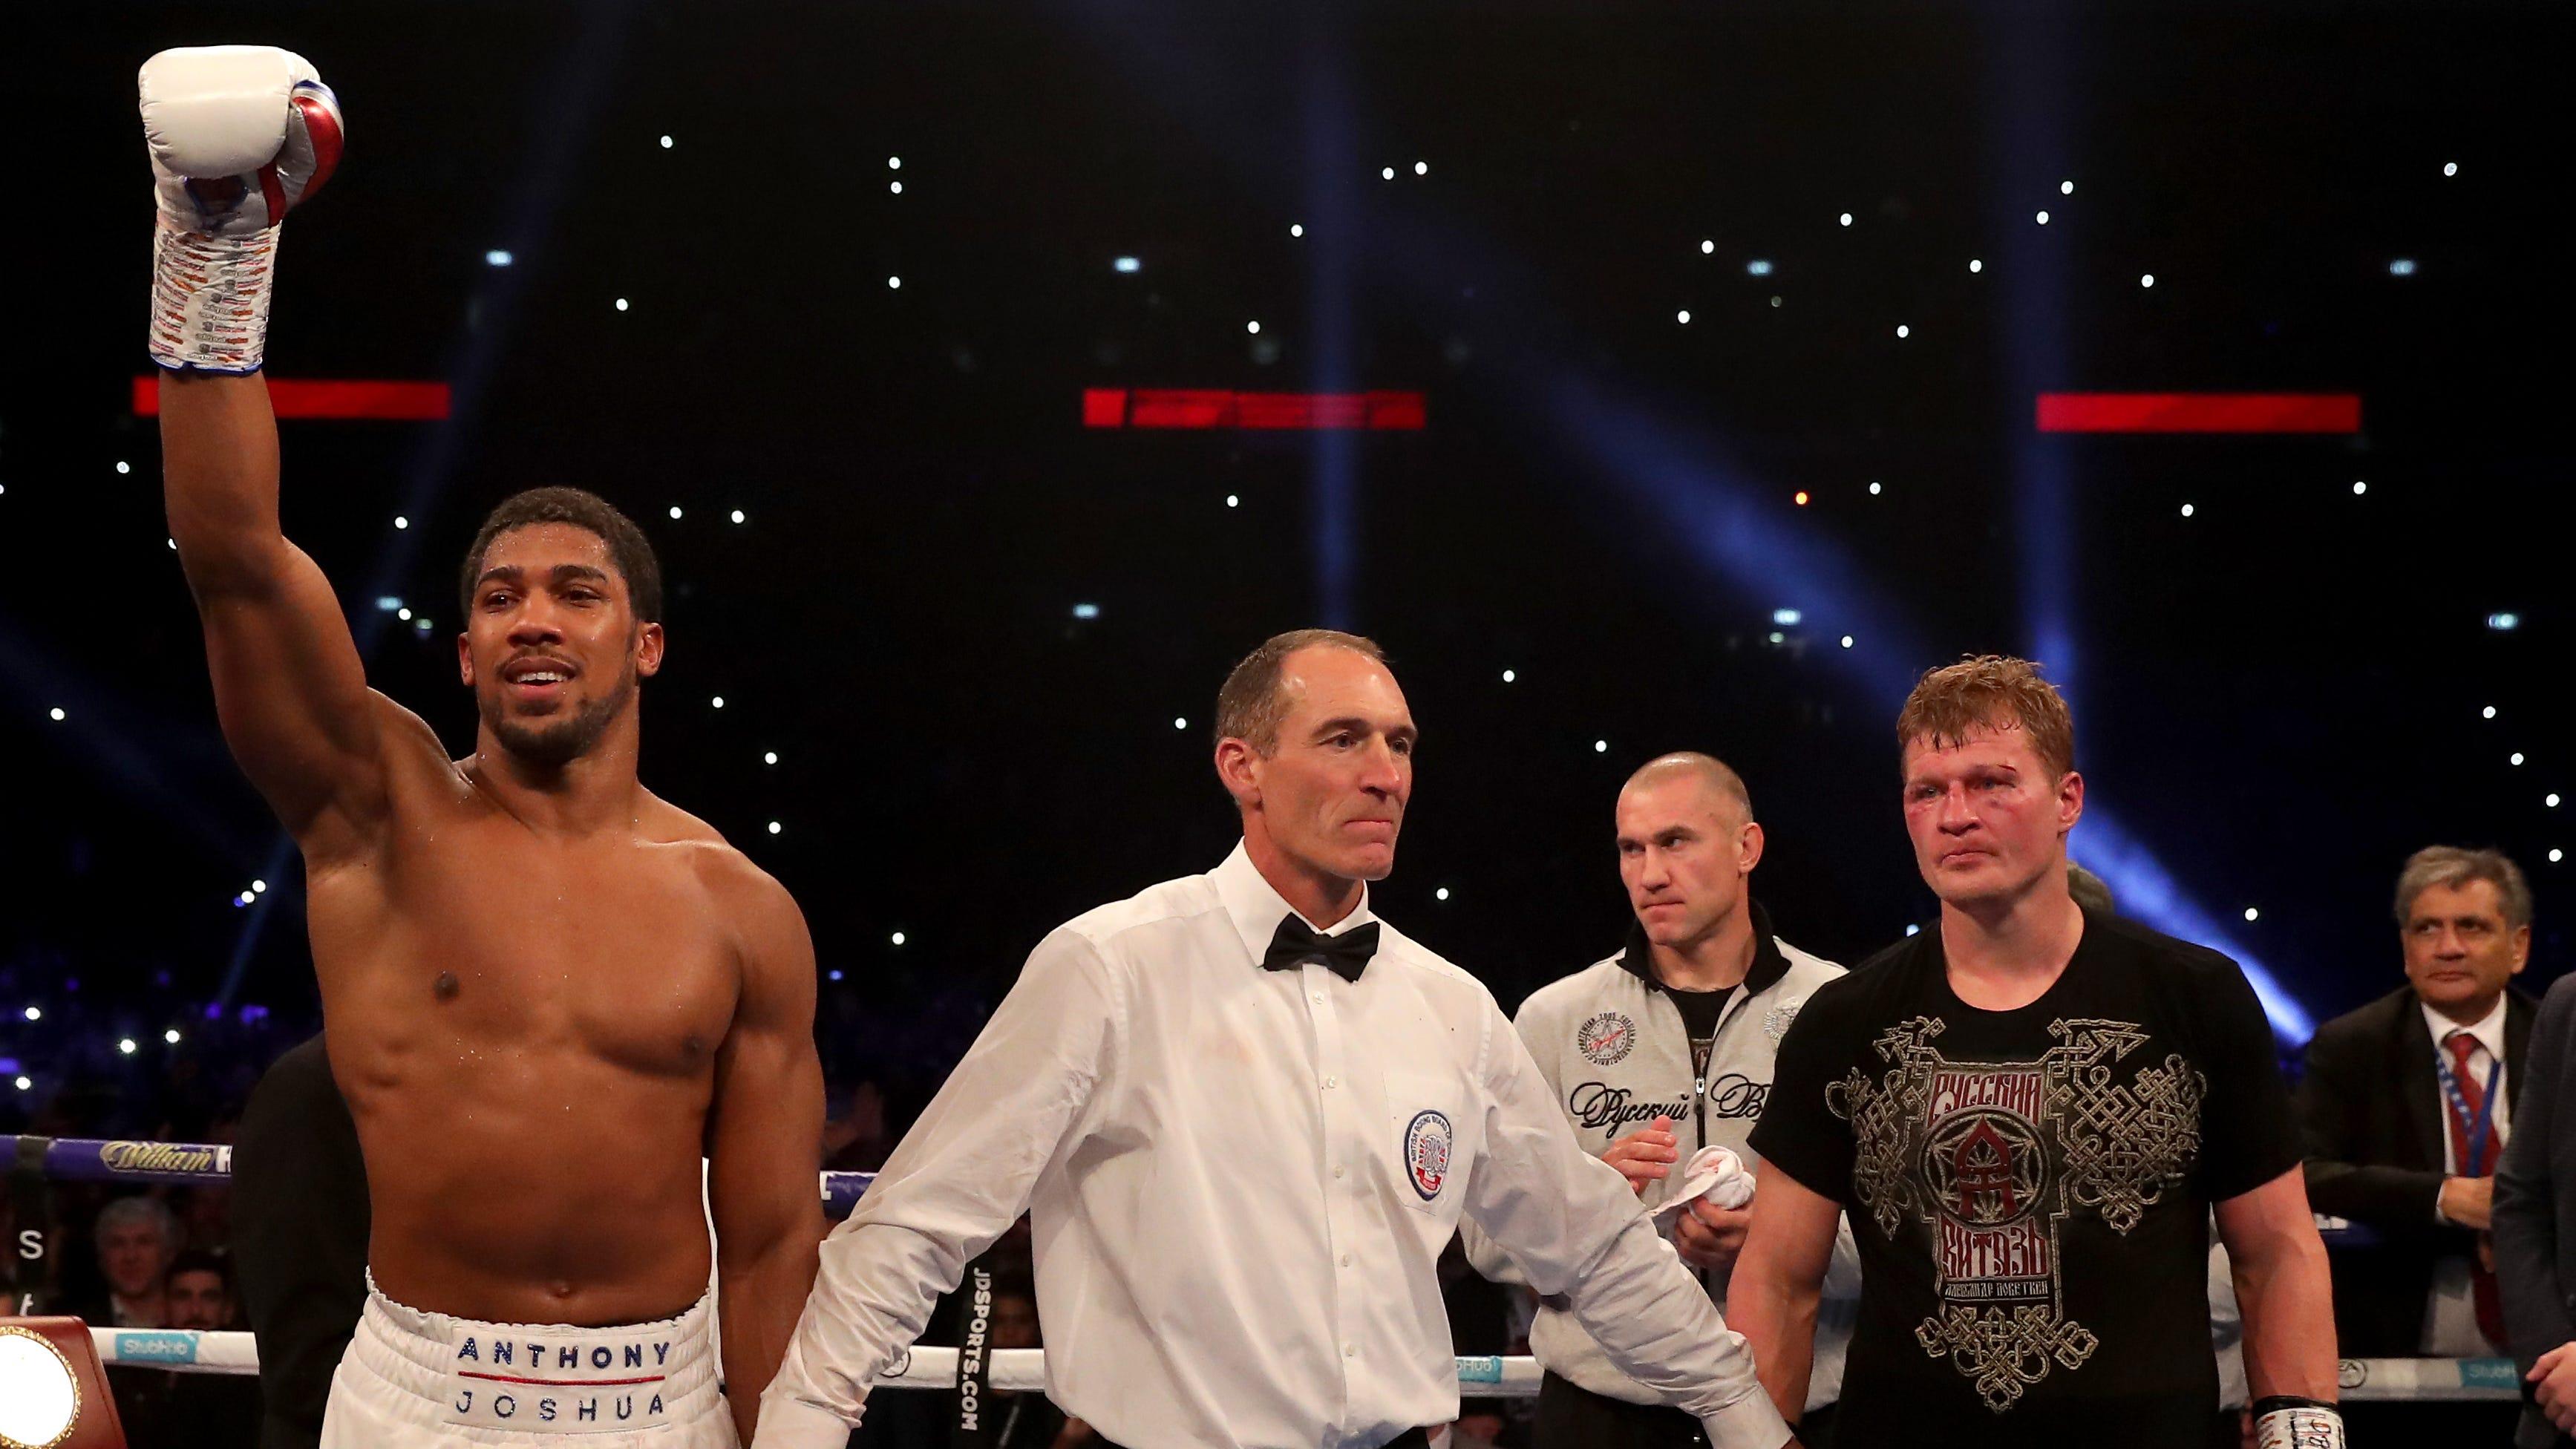 Anthony Joshua celebrates victory against Alexander Povetkin.